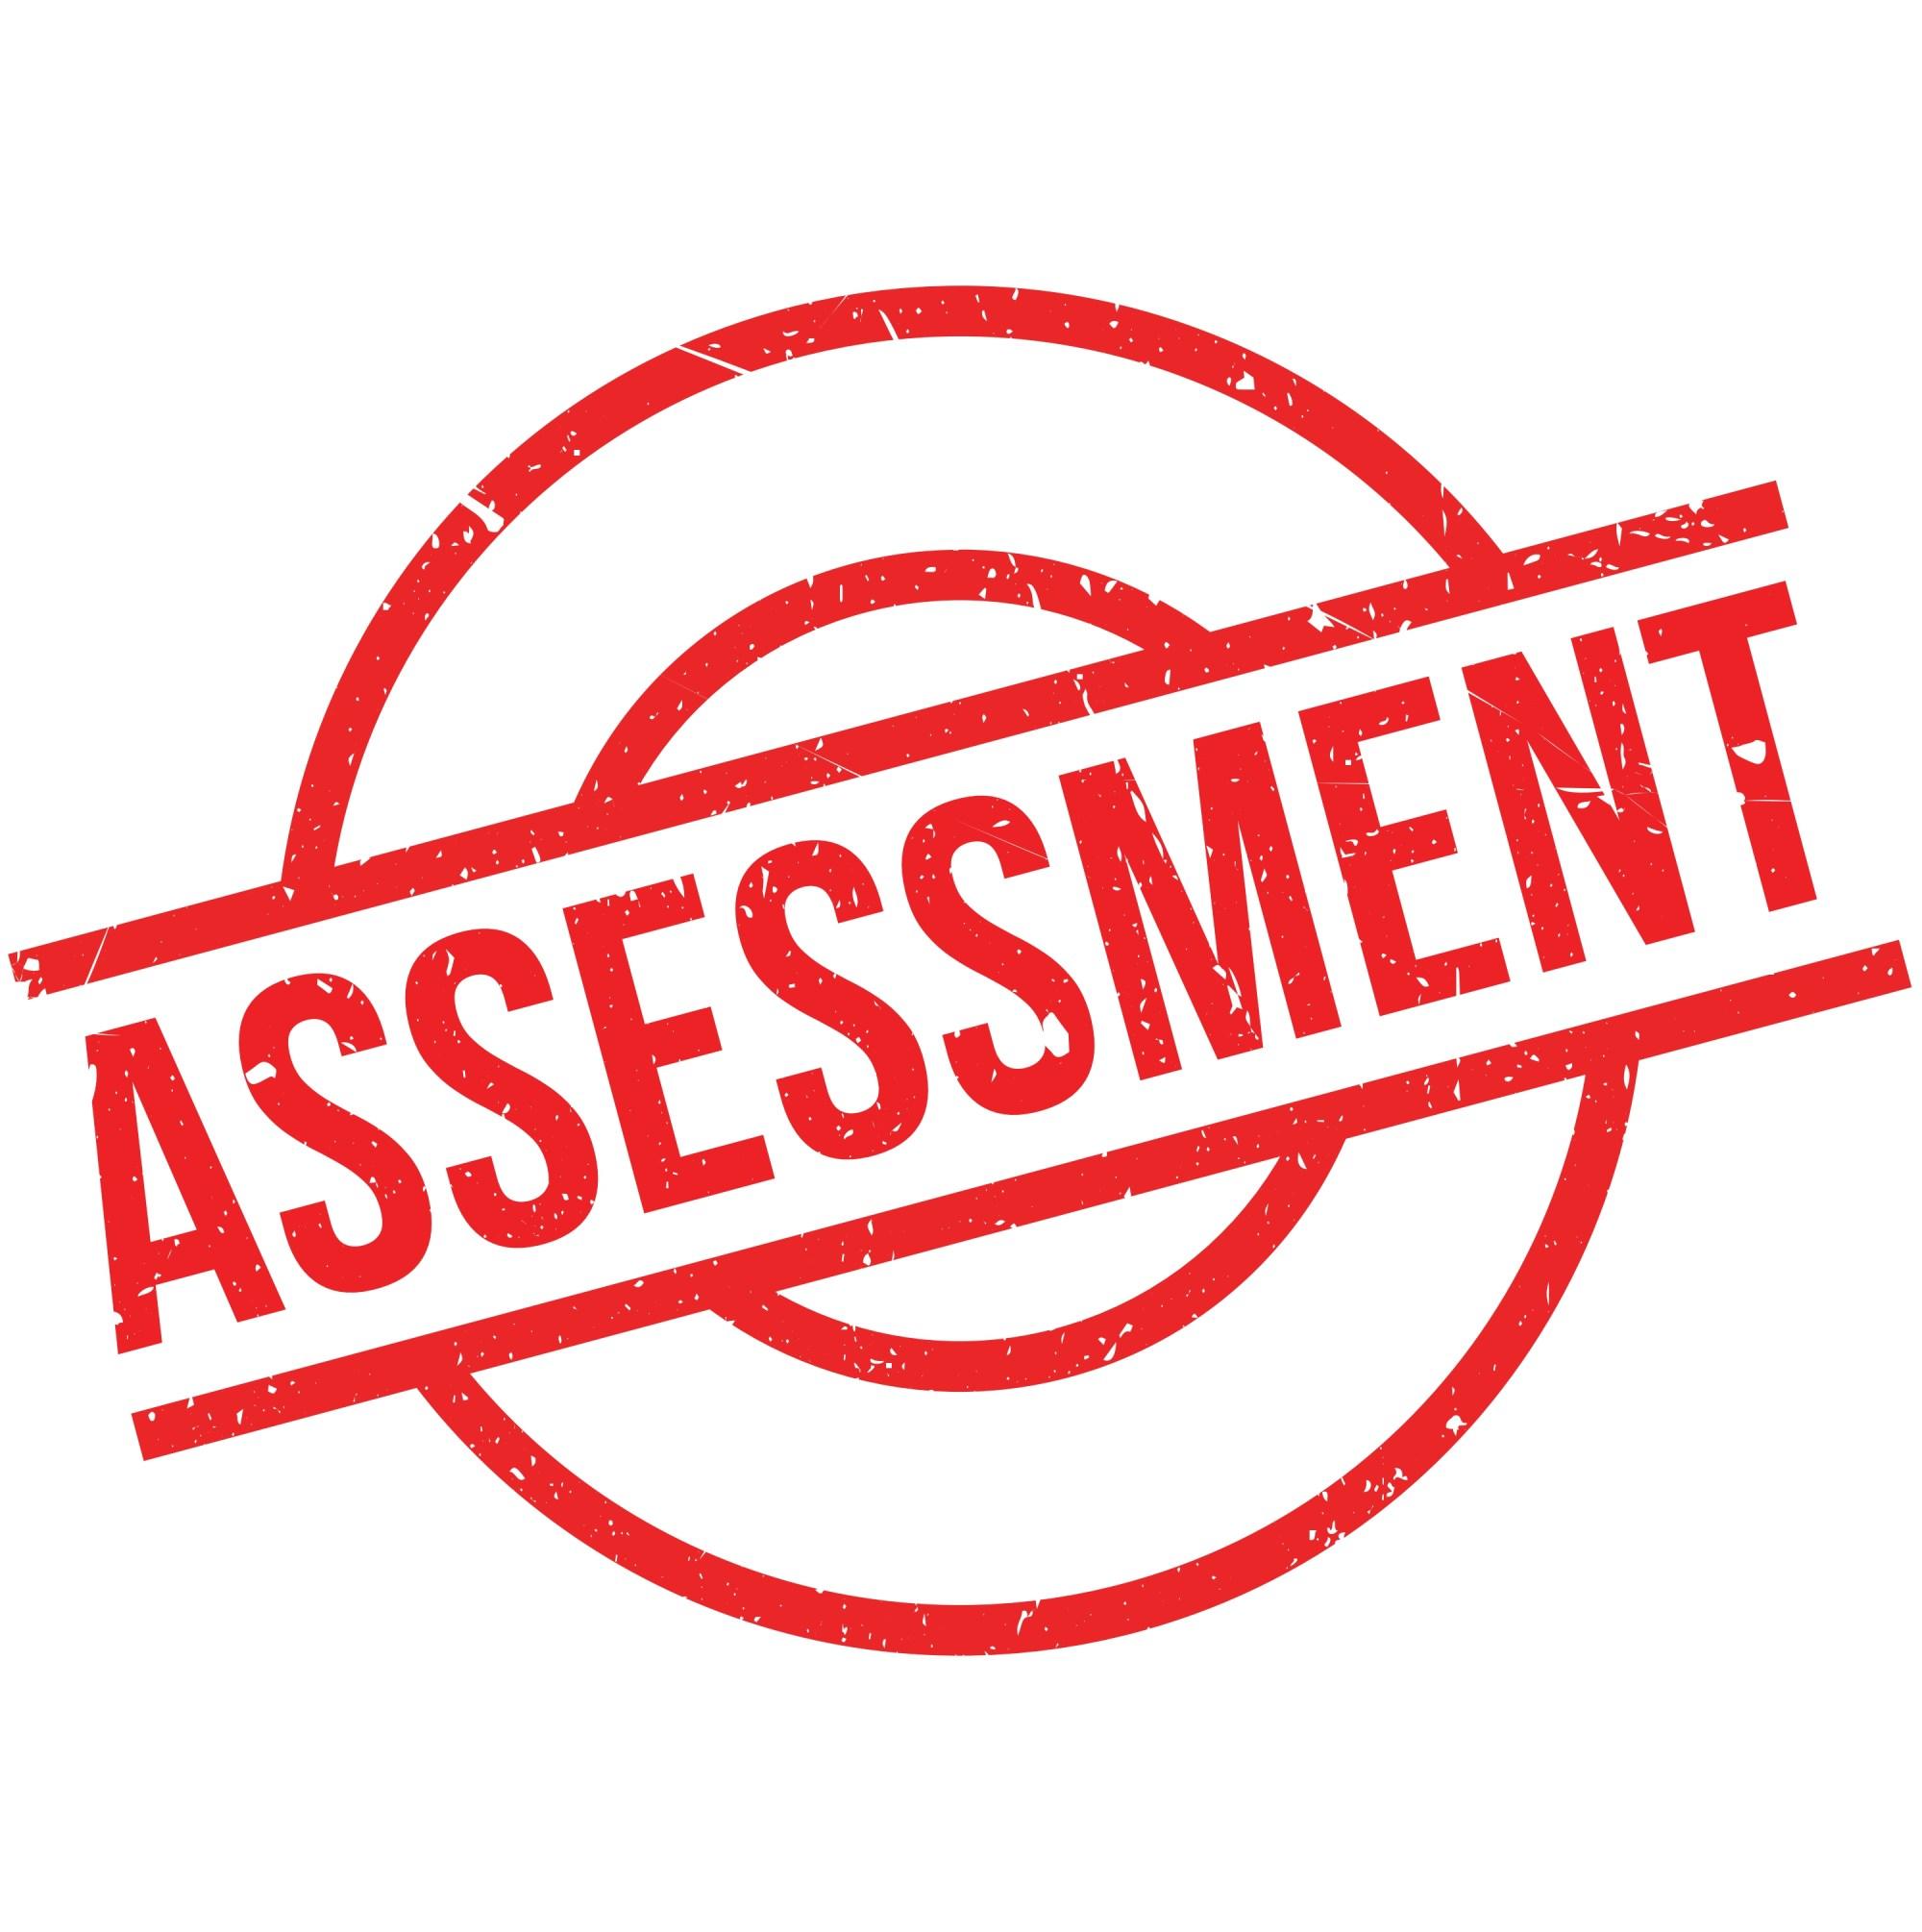 hight resolution of Free Literacy Assessments - Mrs. Judy Araujo